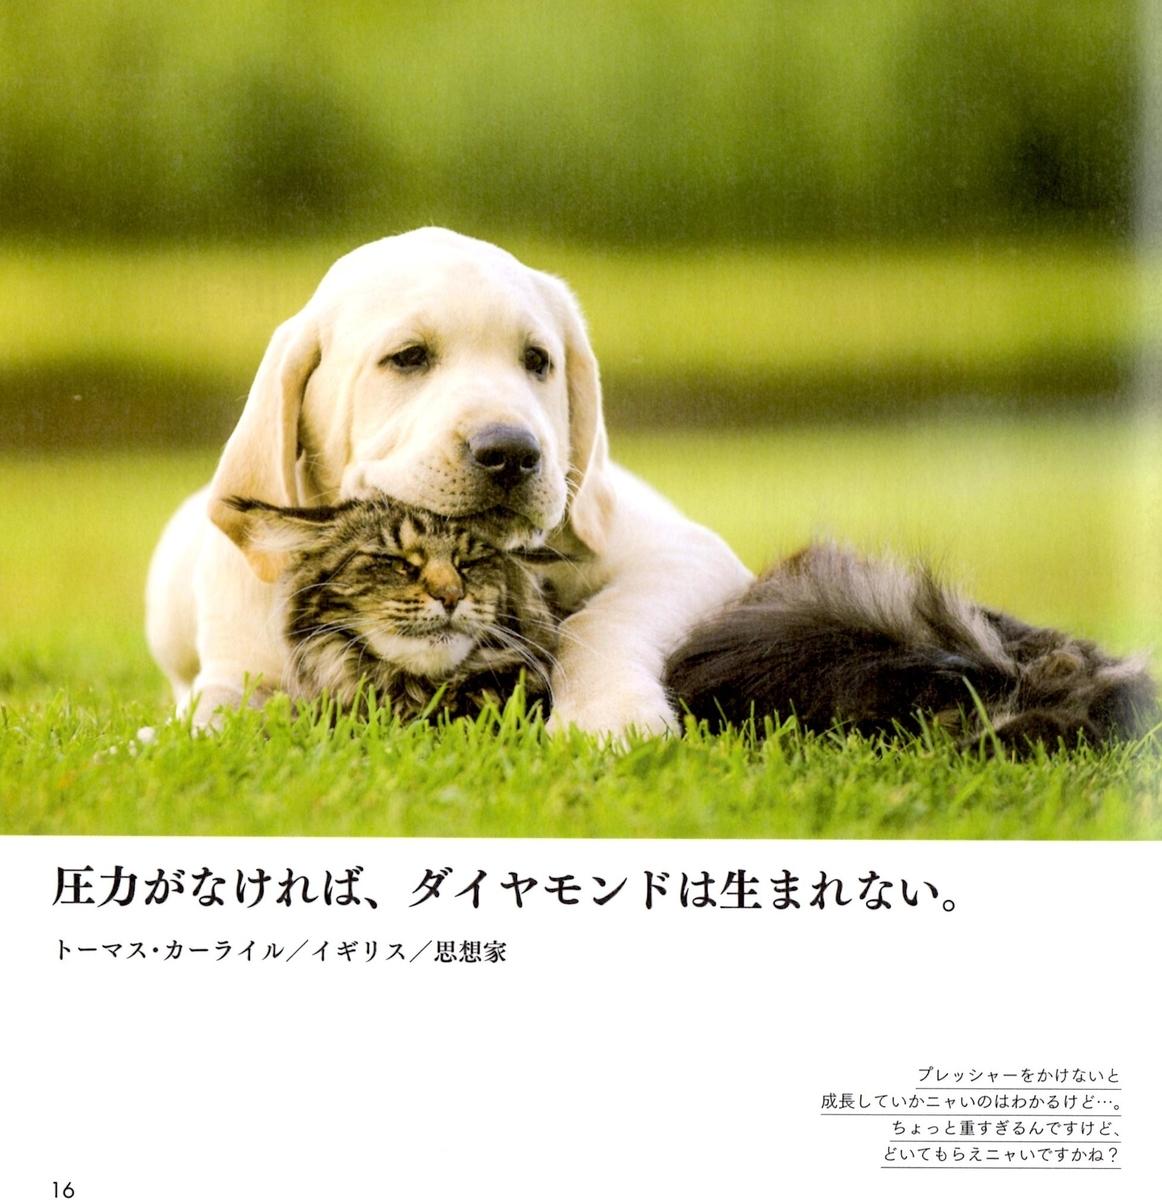 f:id:hamasansu:20190620002205j:plain